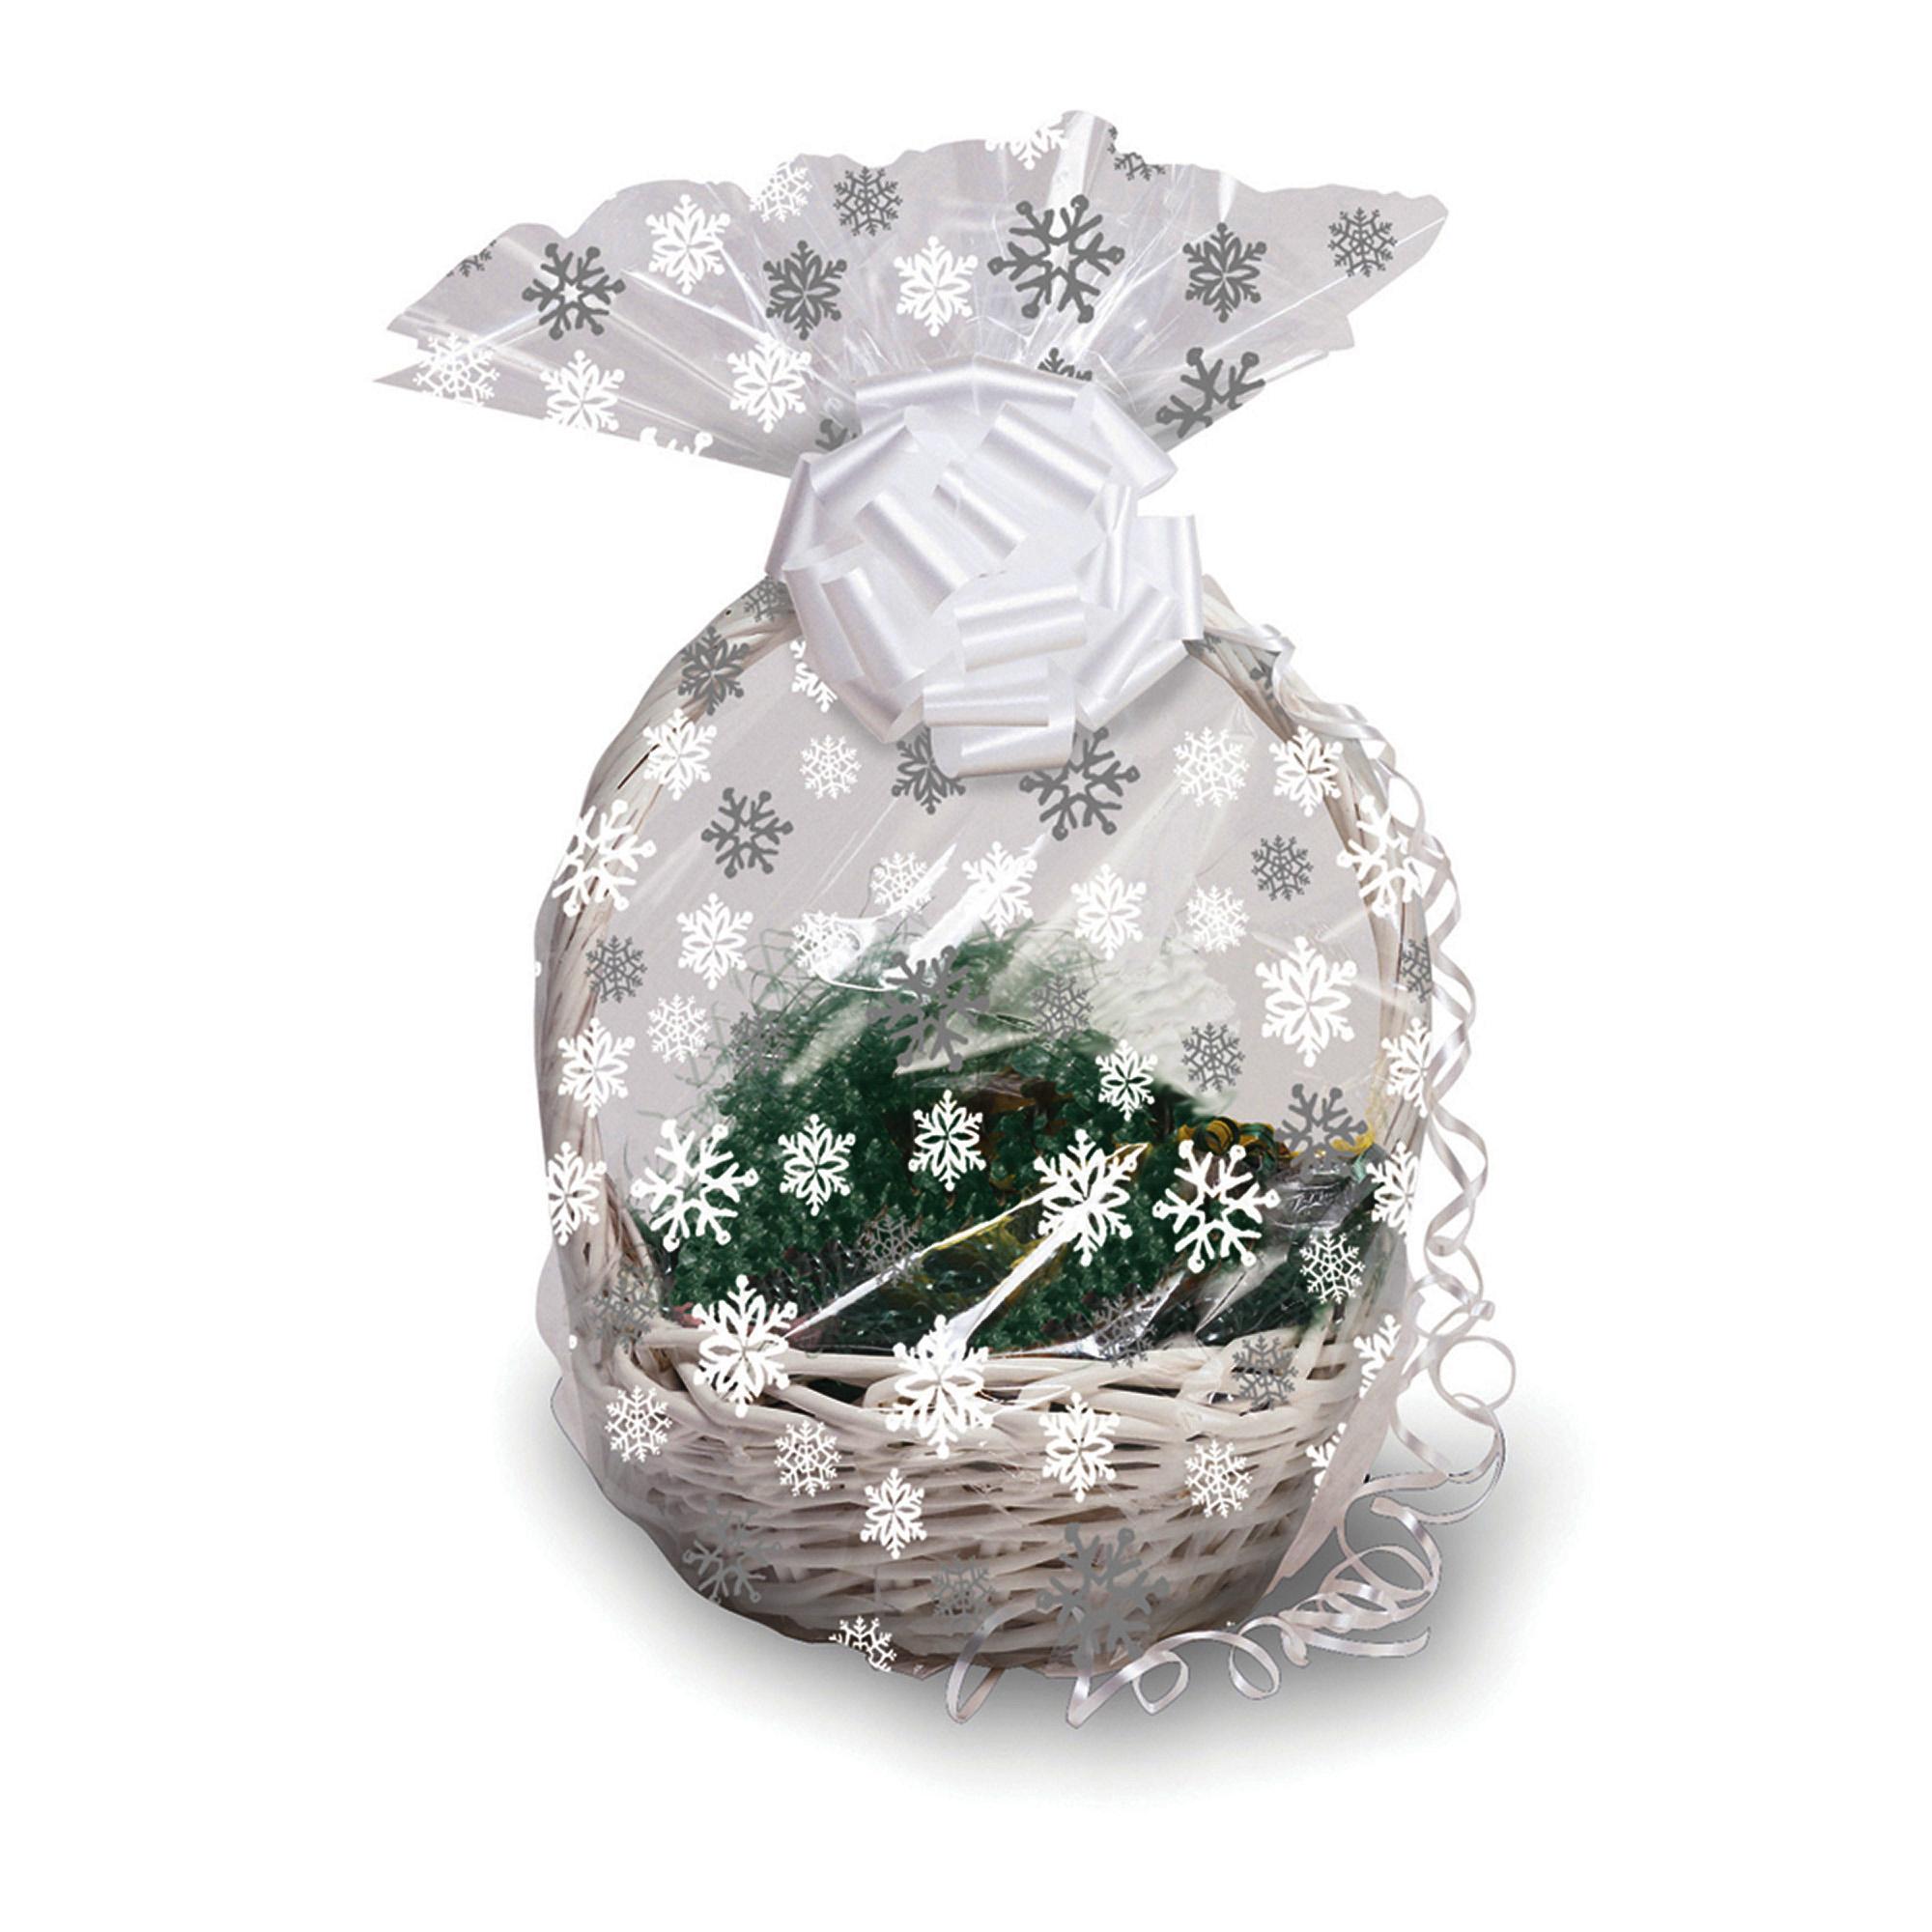 Details About Christmas Snowflakes Hamper Wrap Cellophane Basket Gift Wrap Large Cello Bag